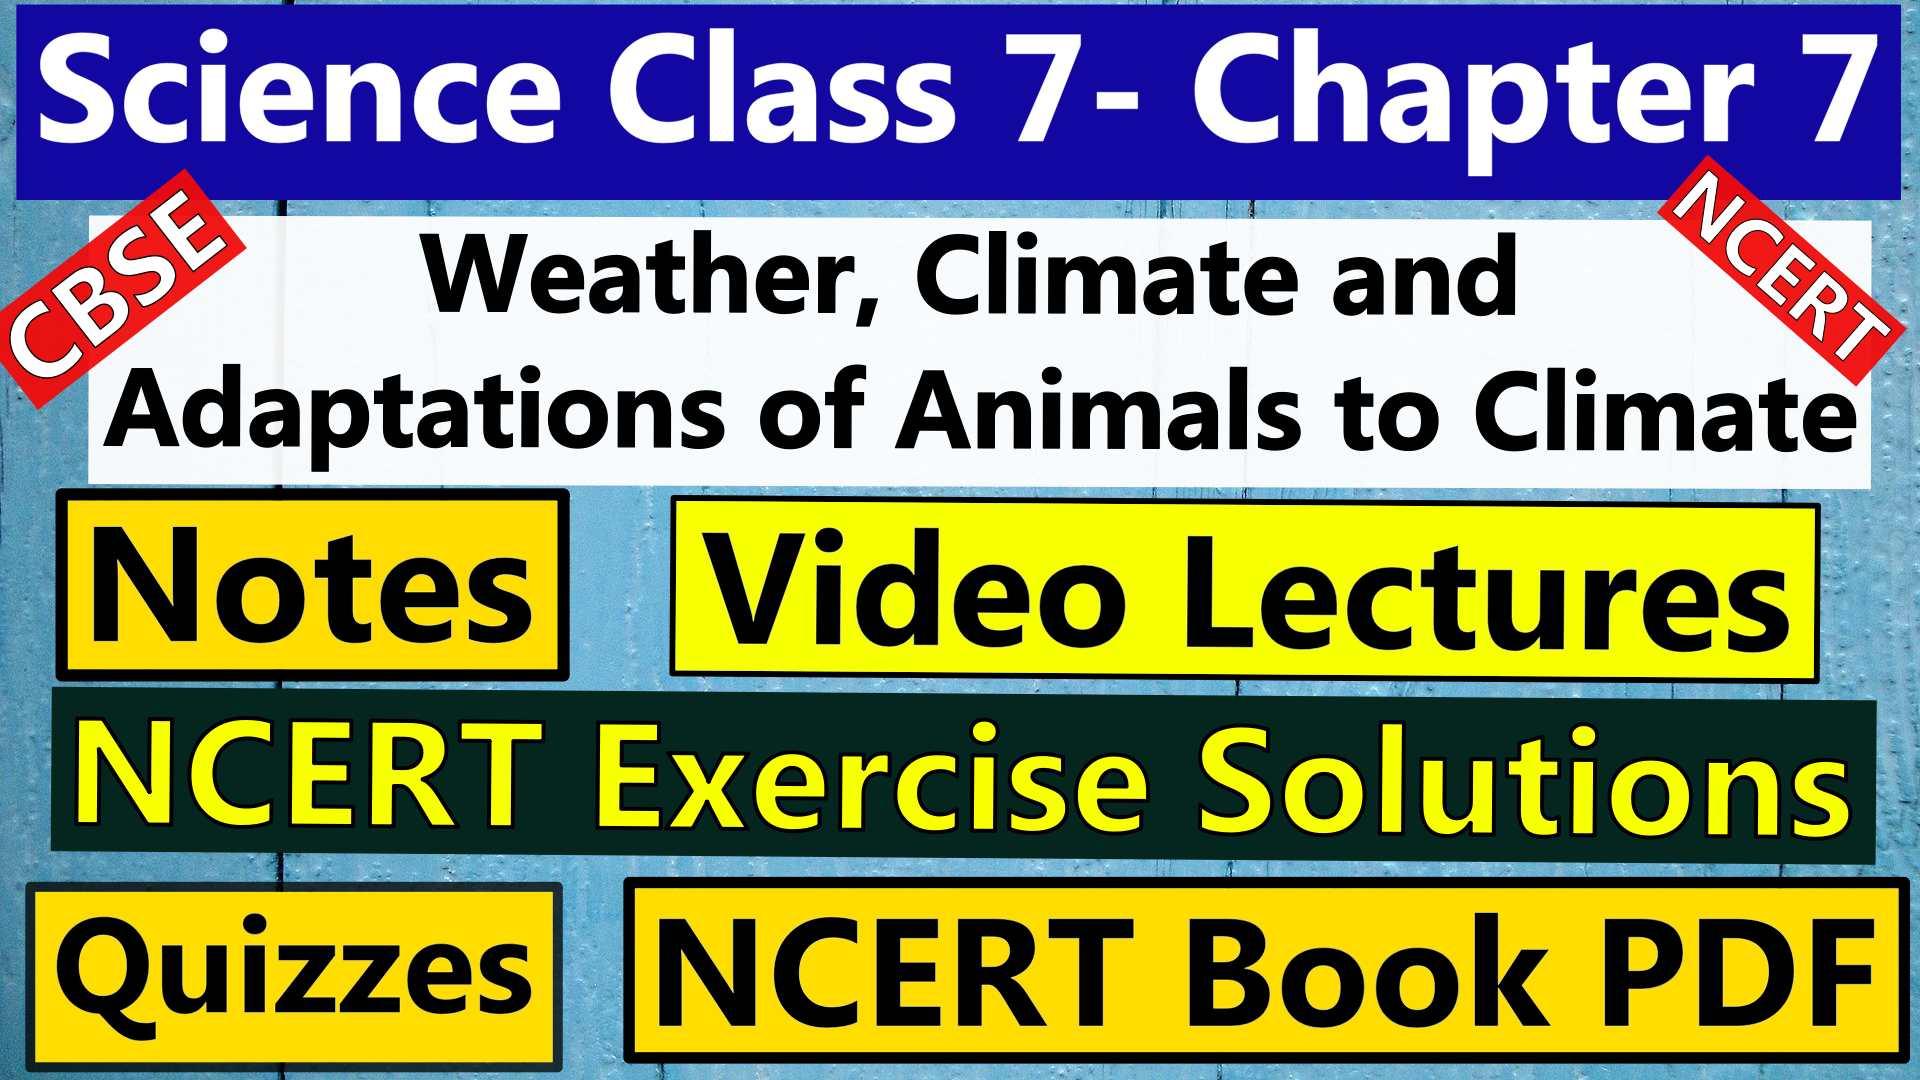 Science Class 7